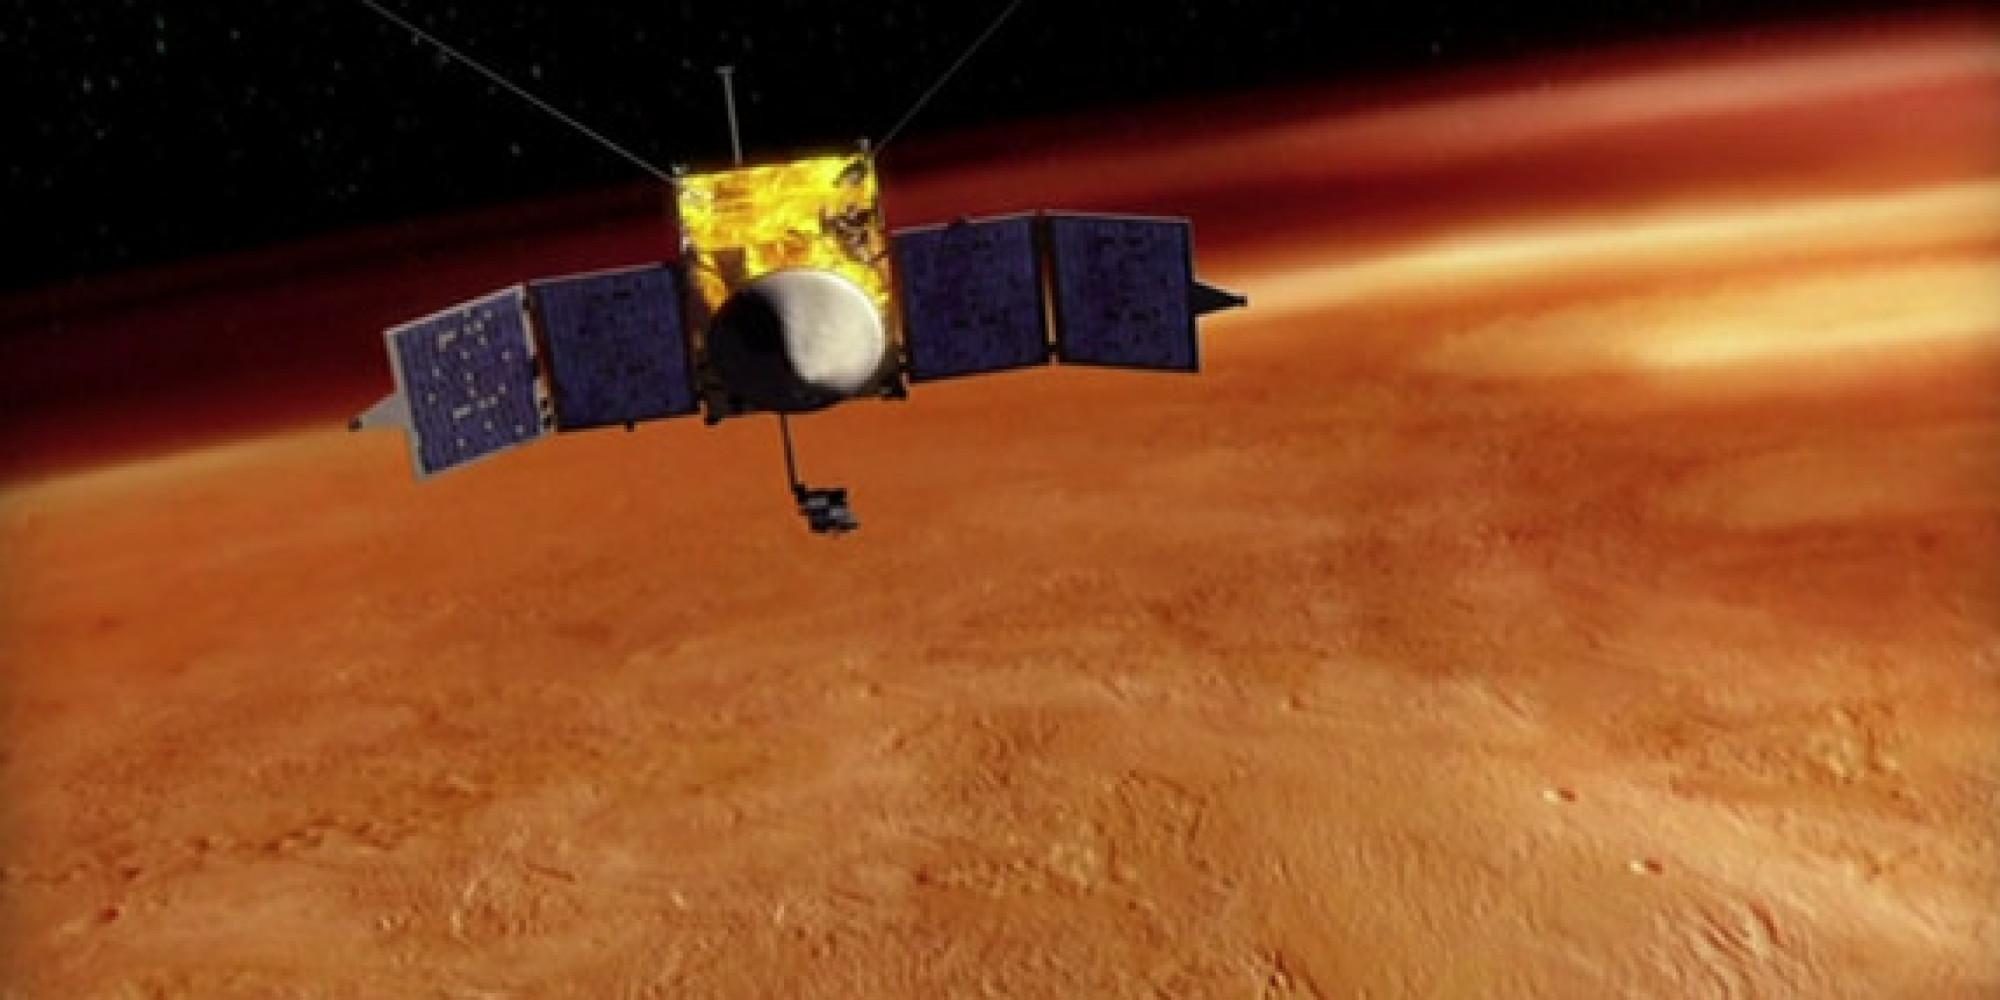 nasa probes sent to mars - photo #6